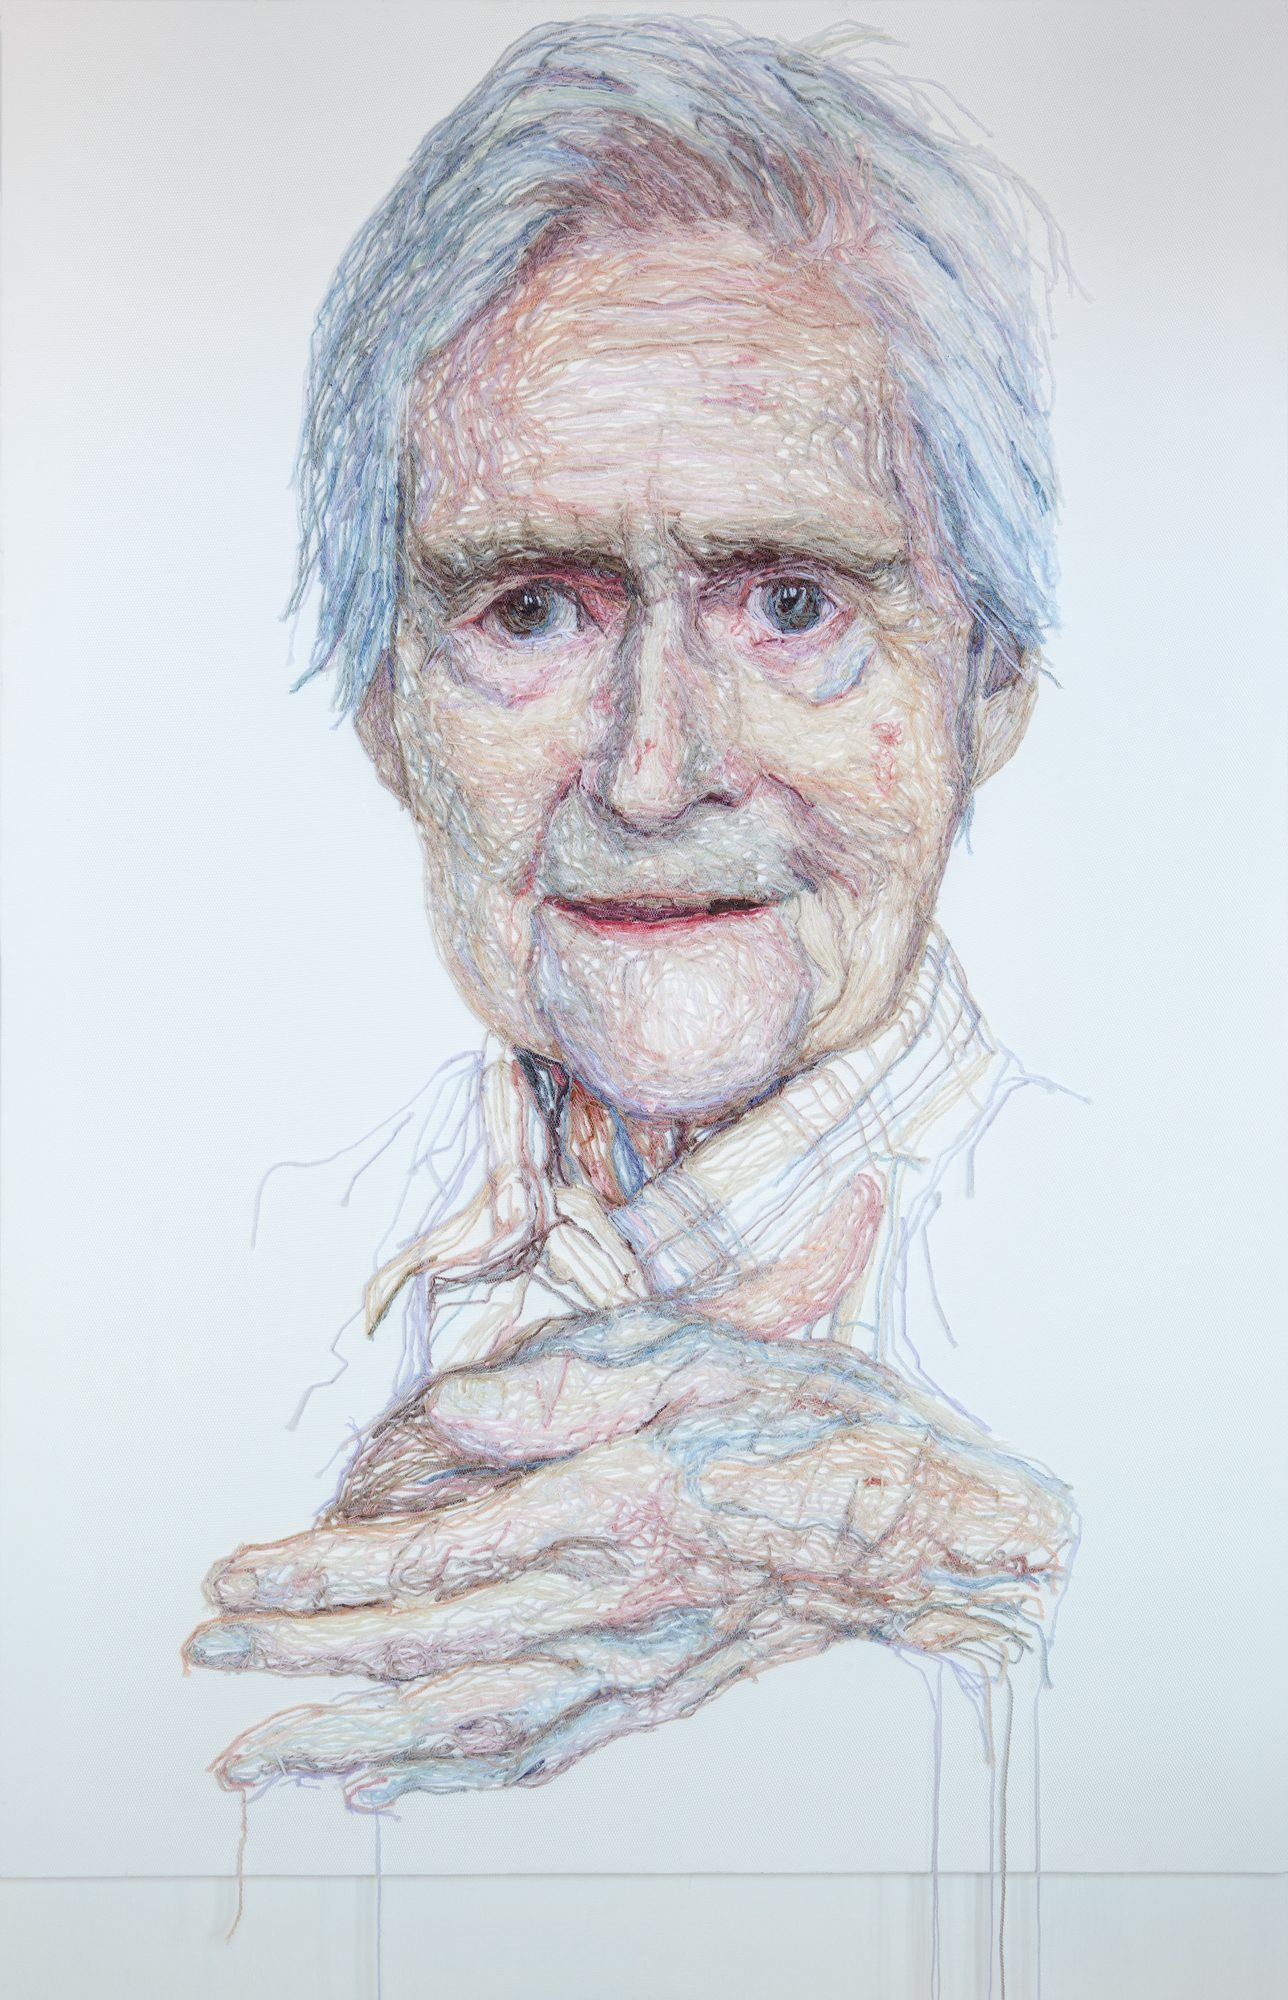 Jenni Dutton, Dementia Darning, Mum rubbing her hands, 2012, wollen draden, netting, canvas, 130 x 90 cm - foto Rupert Mardon.